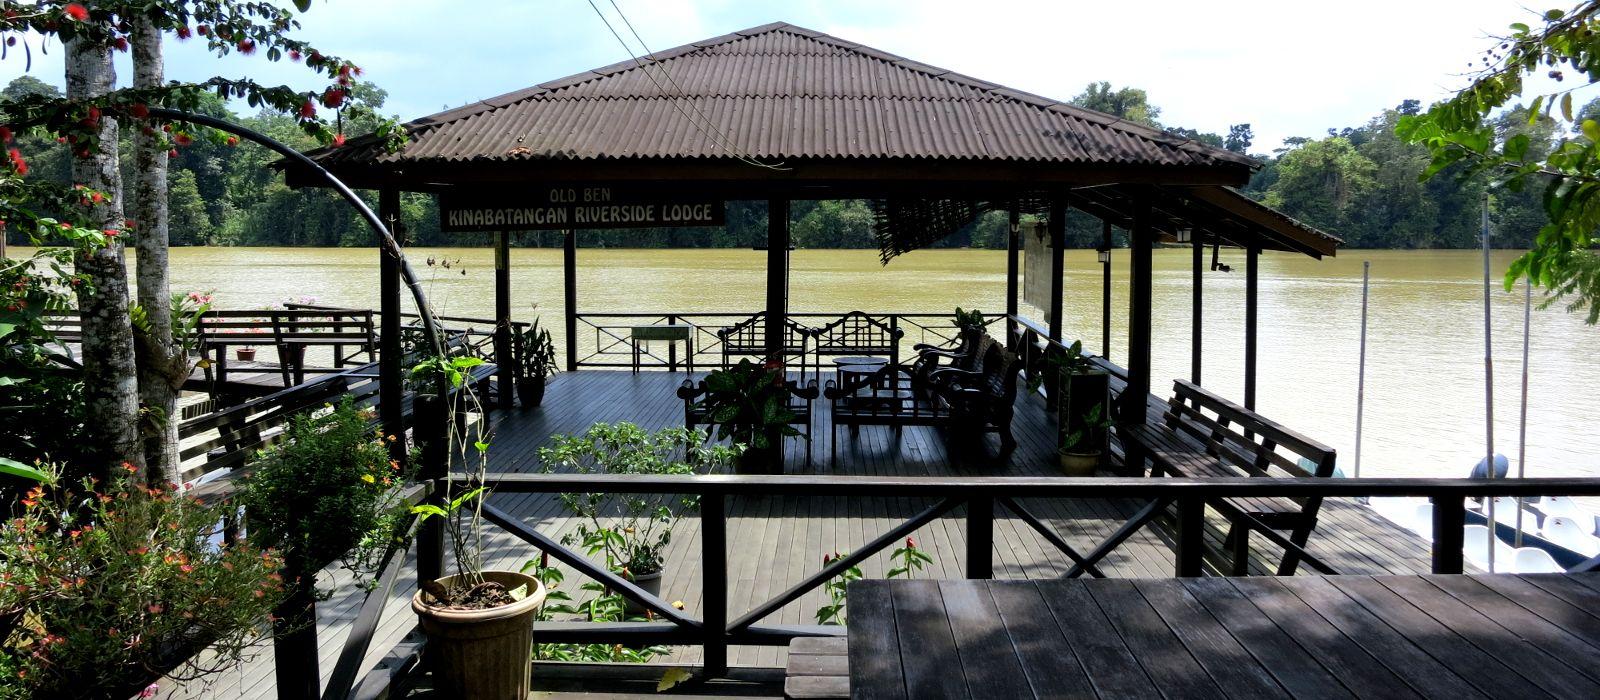 Hotel Kinabatangan Riverside Lodge Malaysia